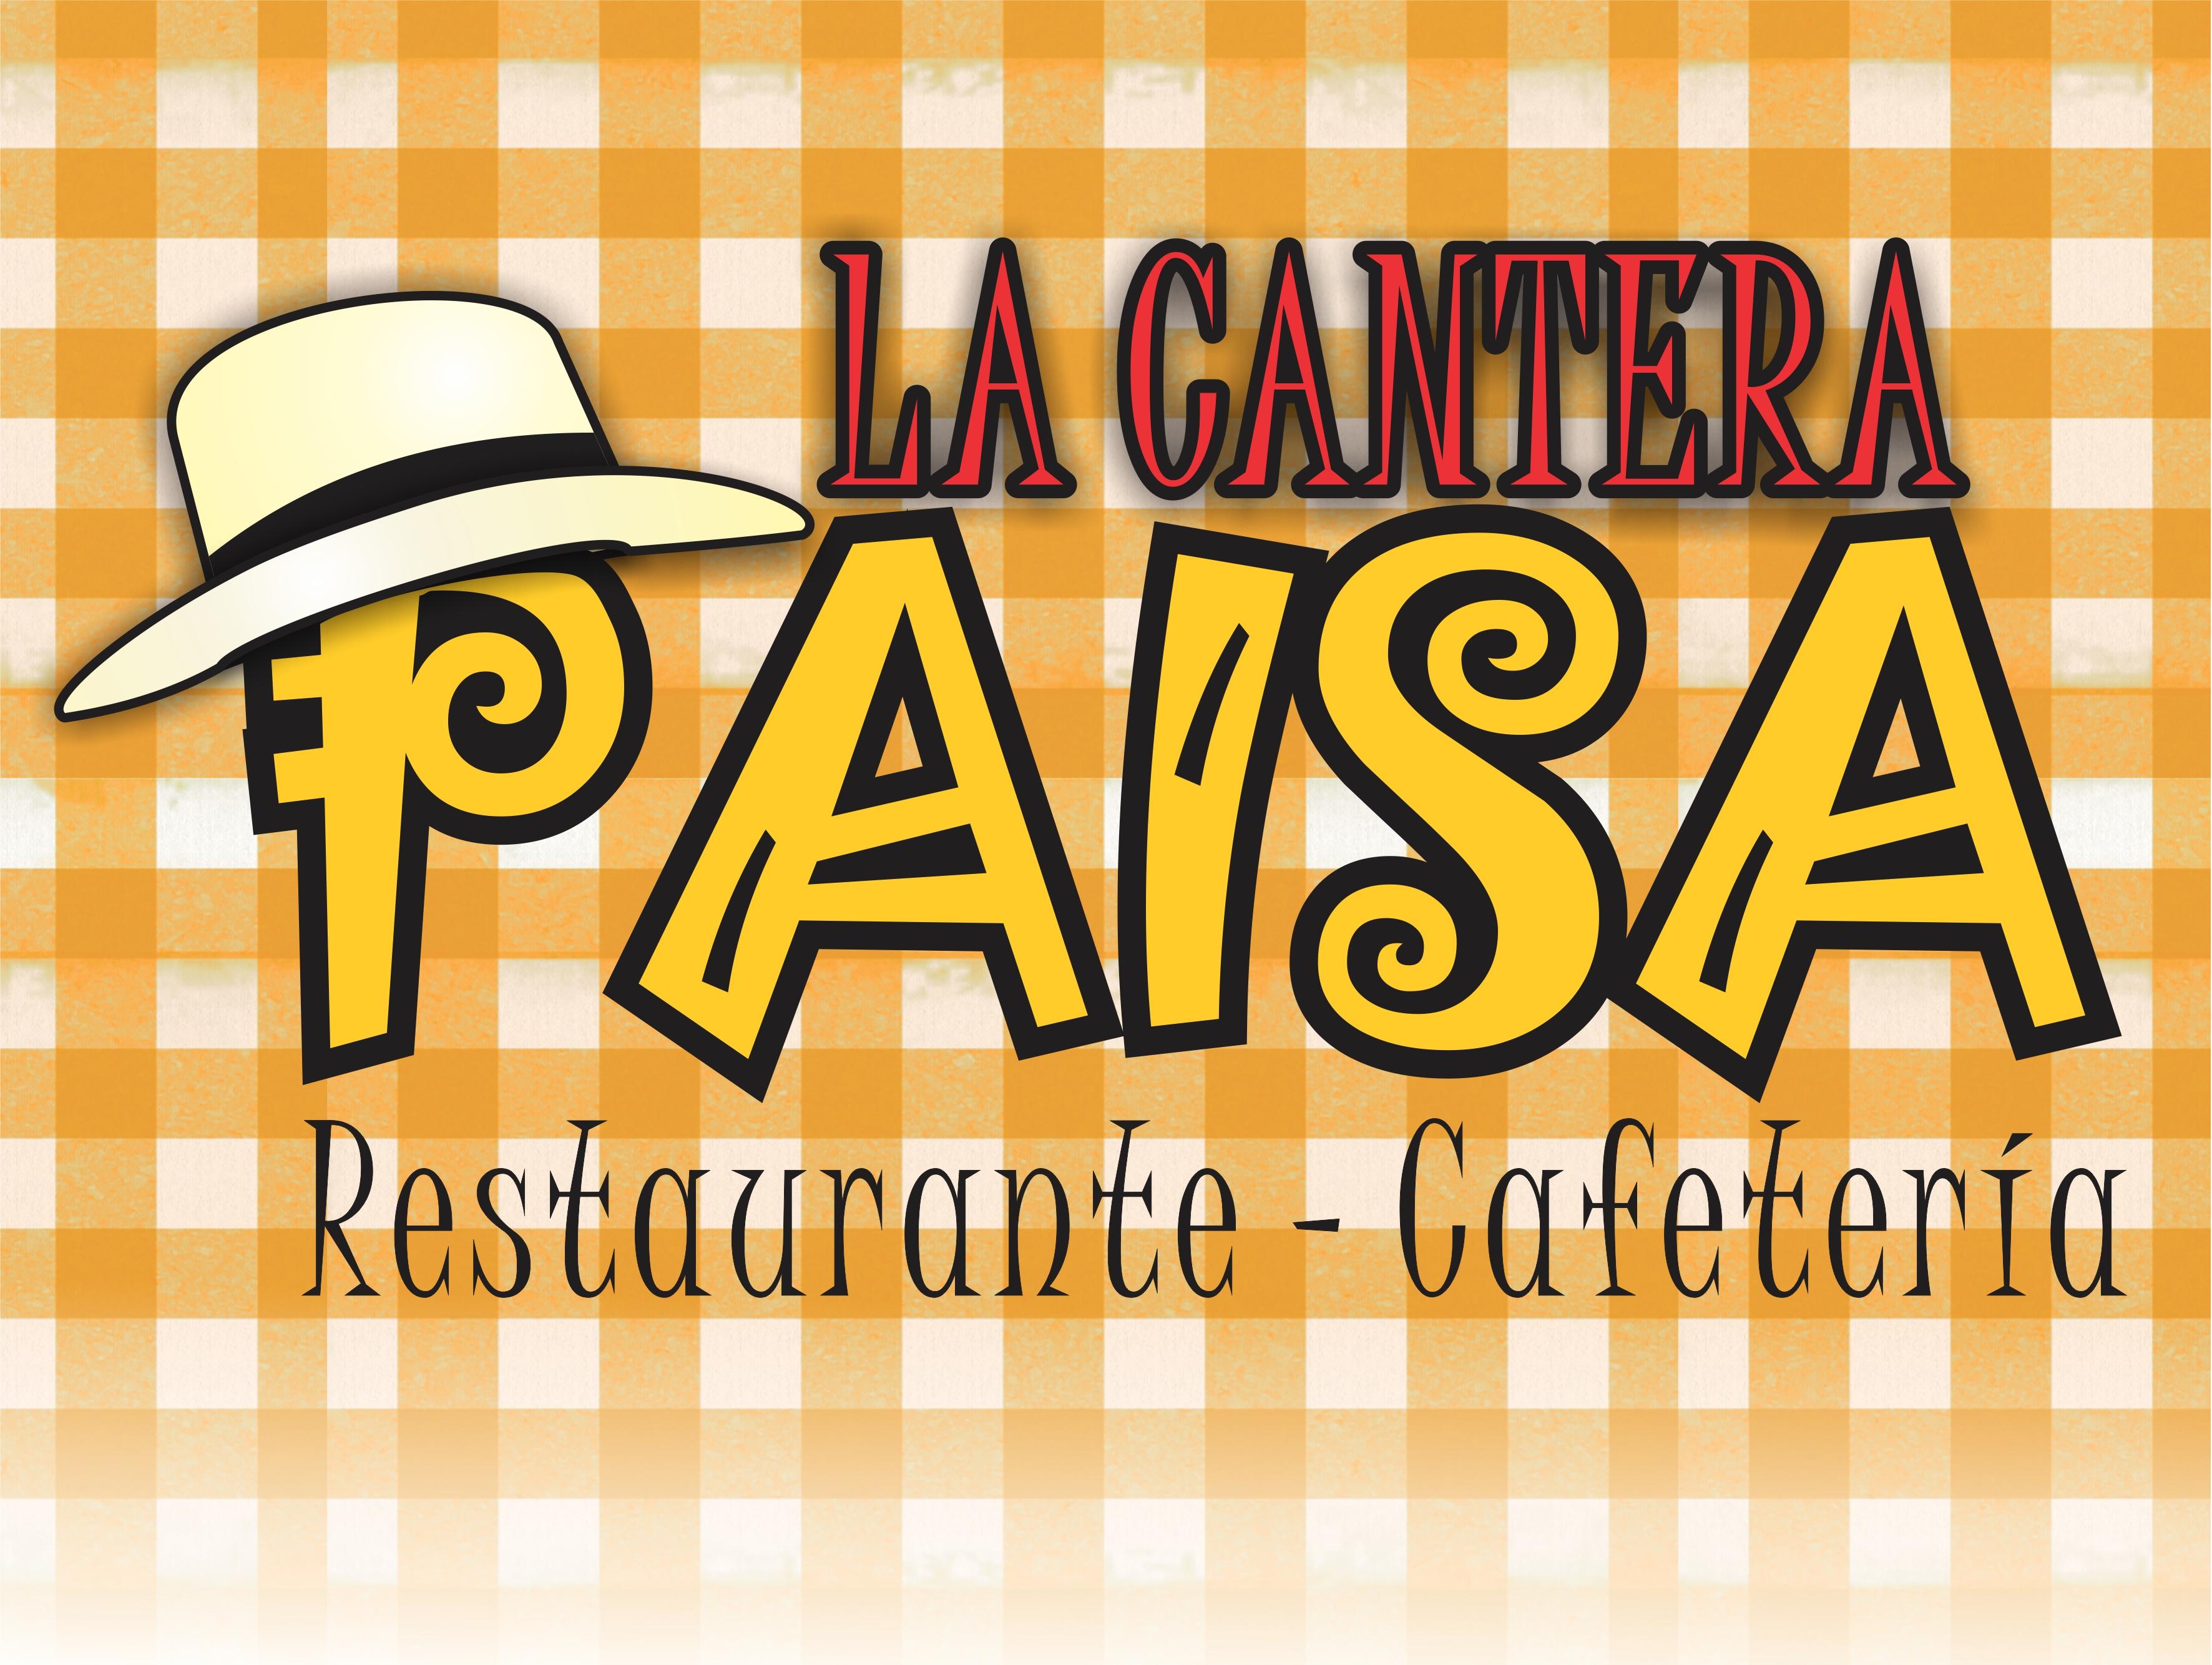 La Cantera Paisa Las Palmas